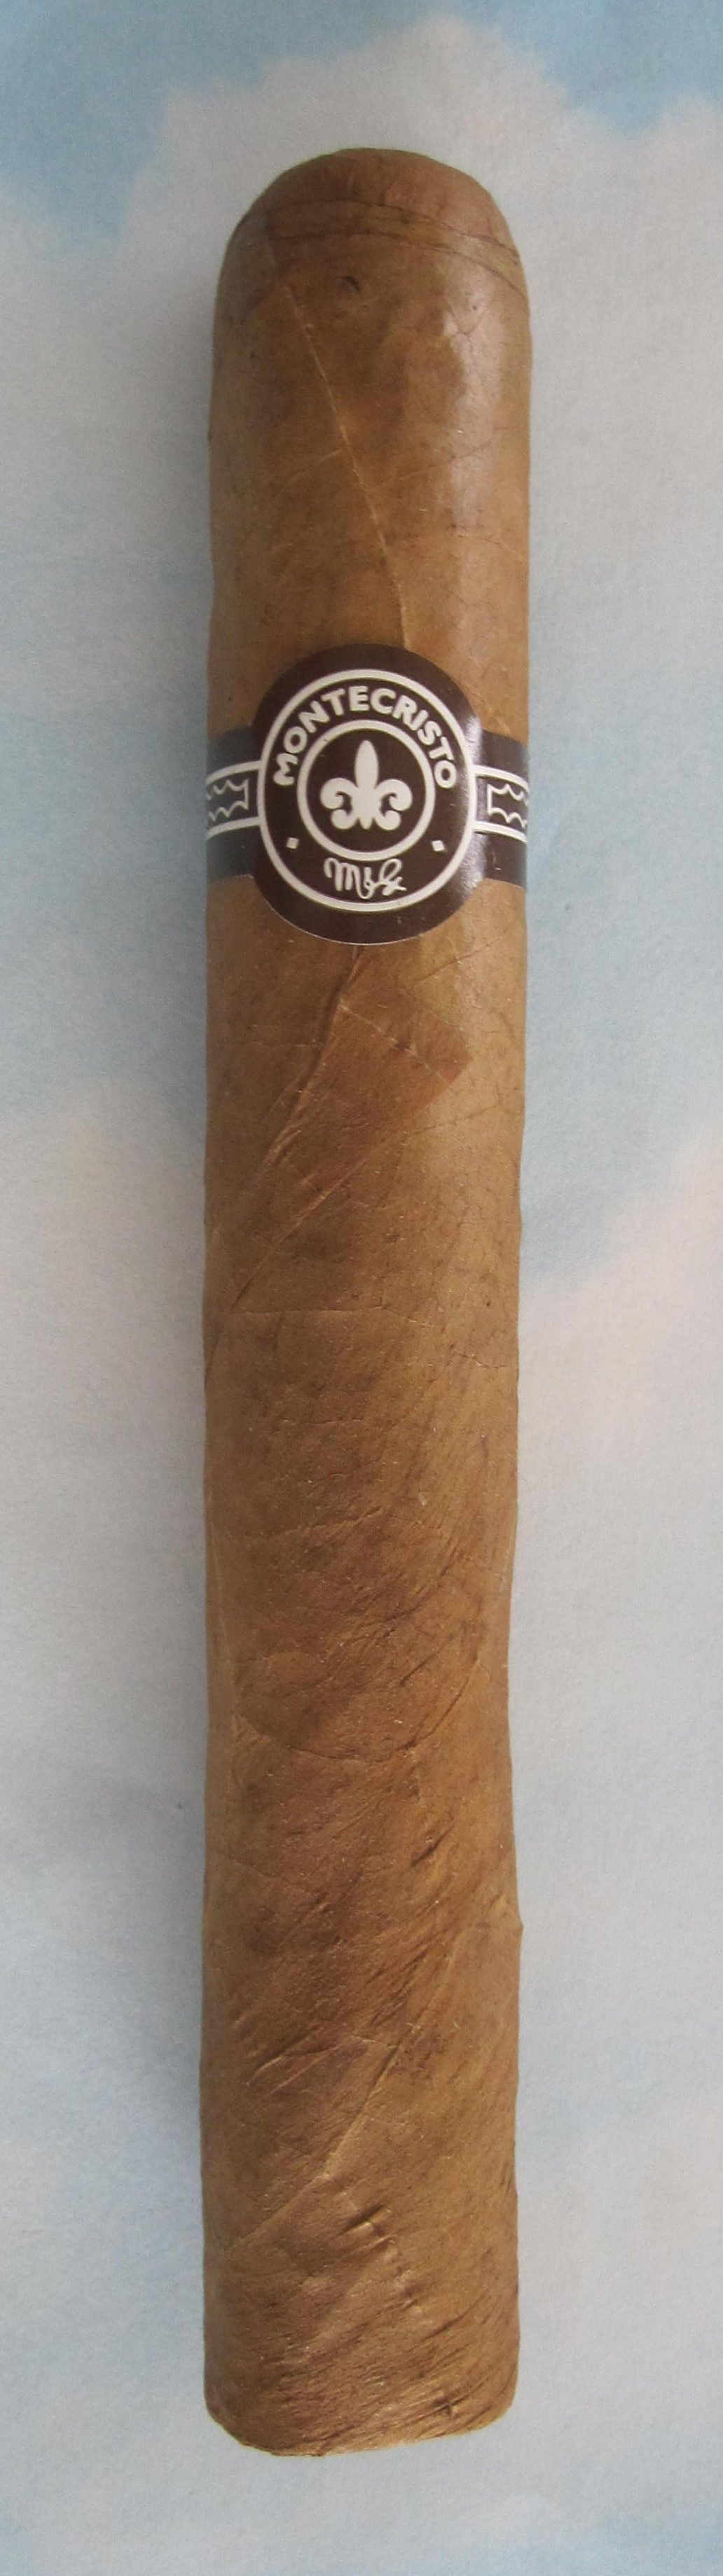 Montecristo Robusto Larga Cigar